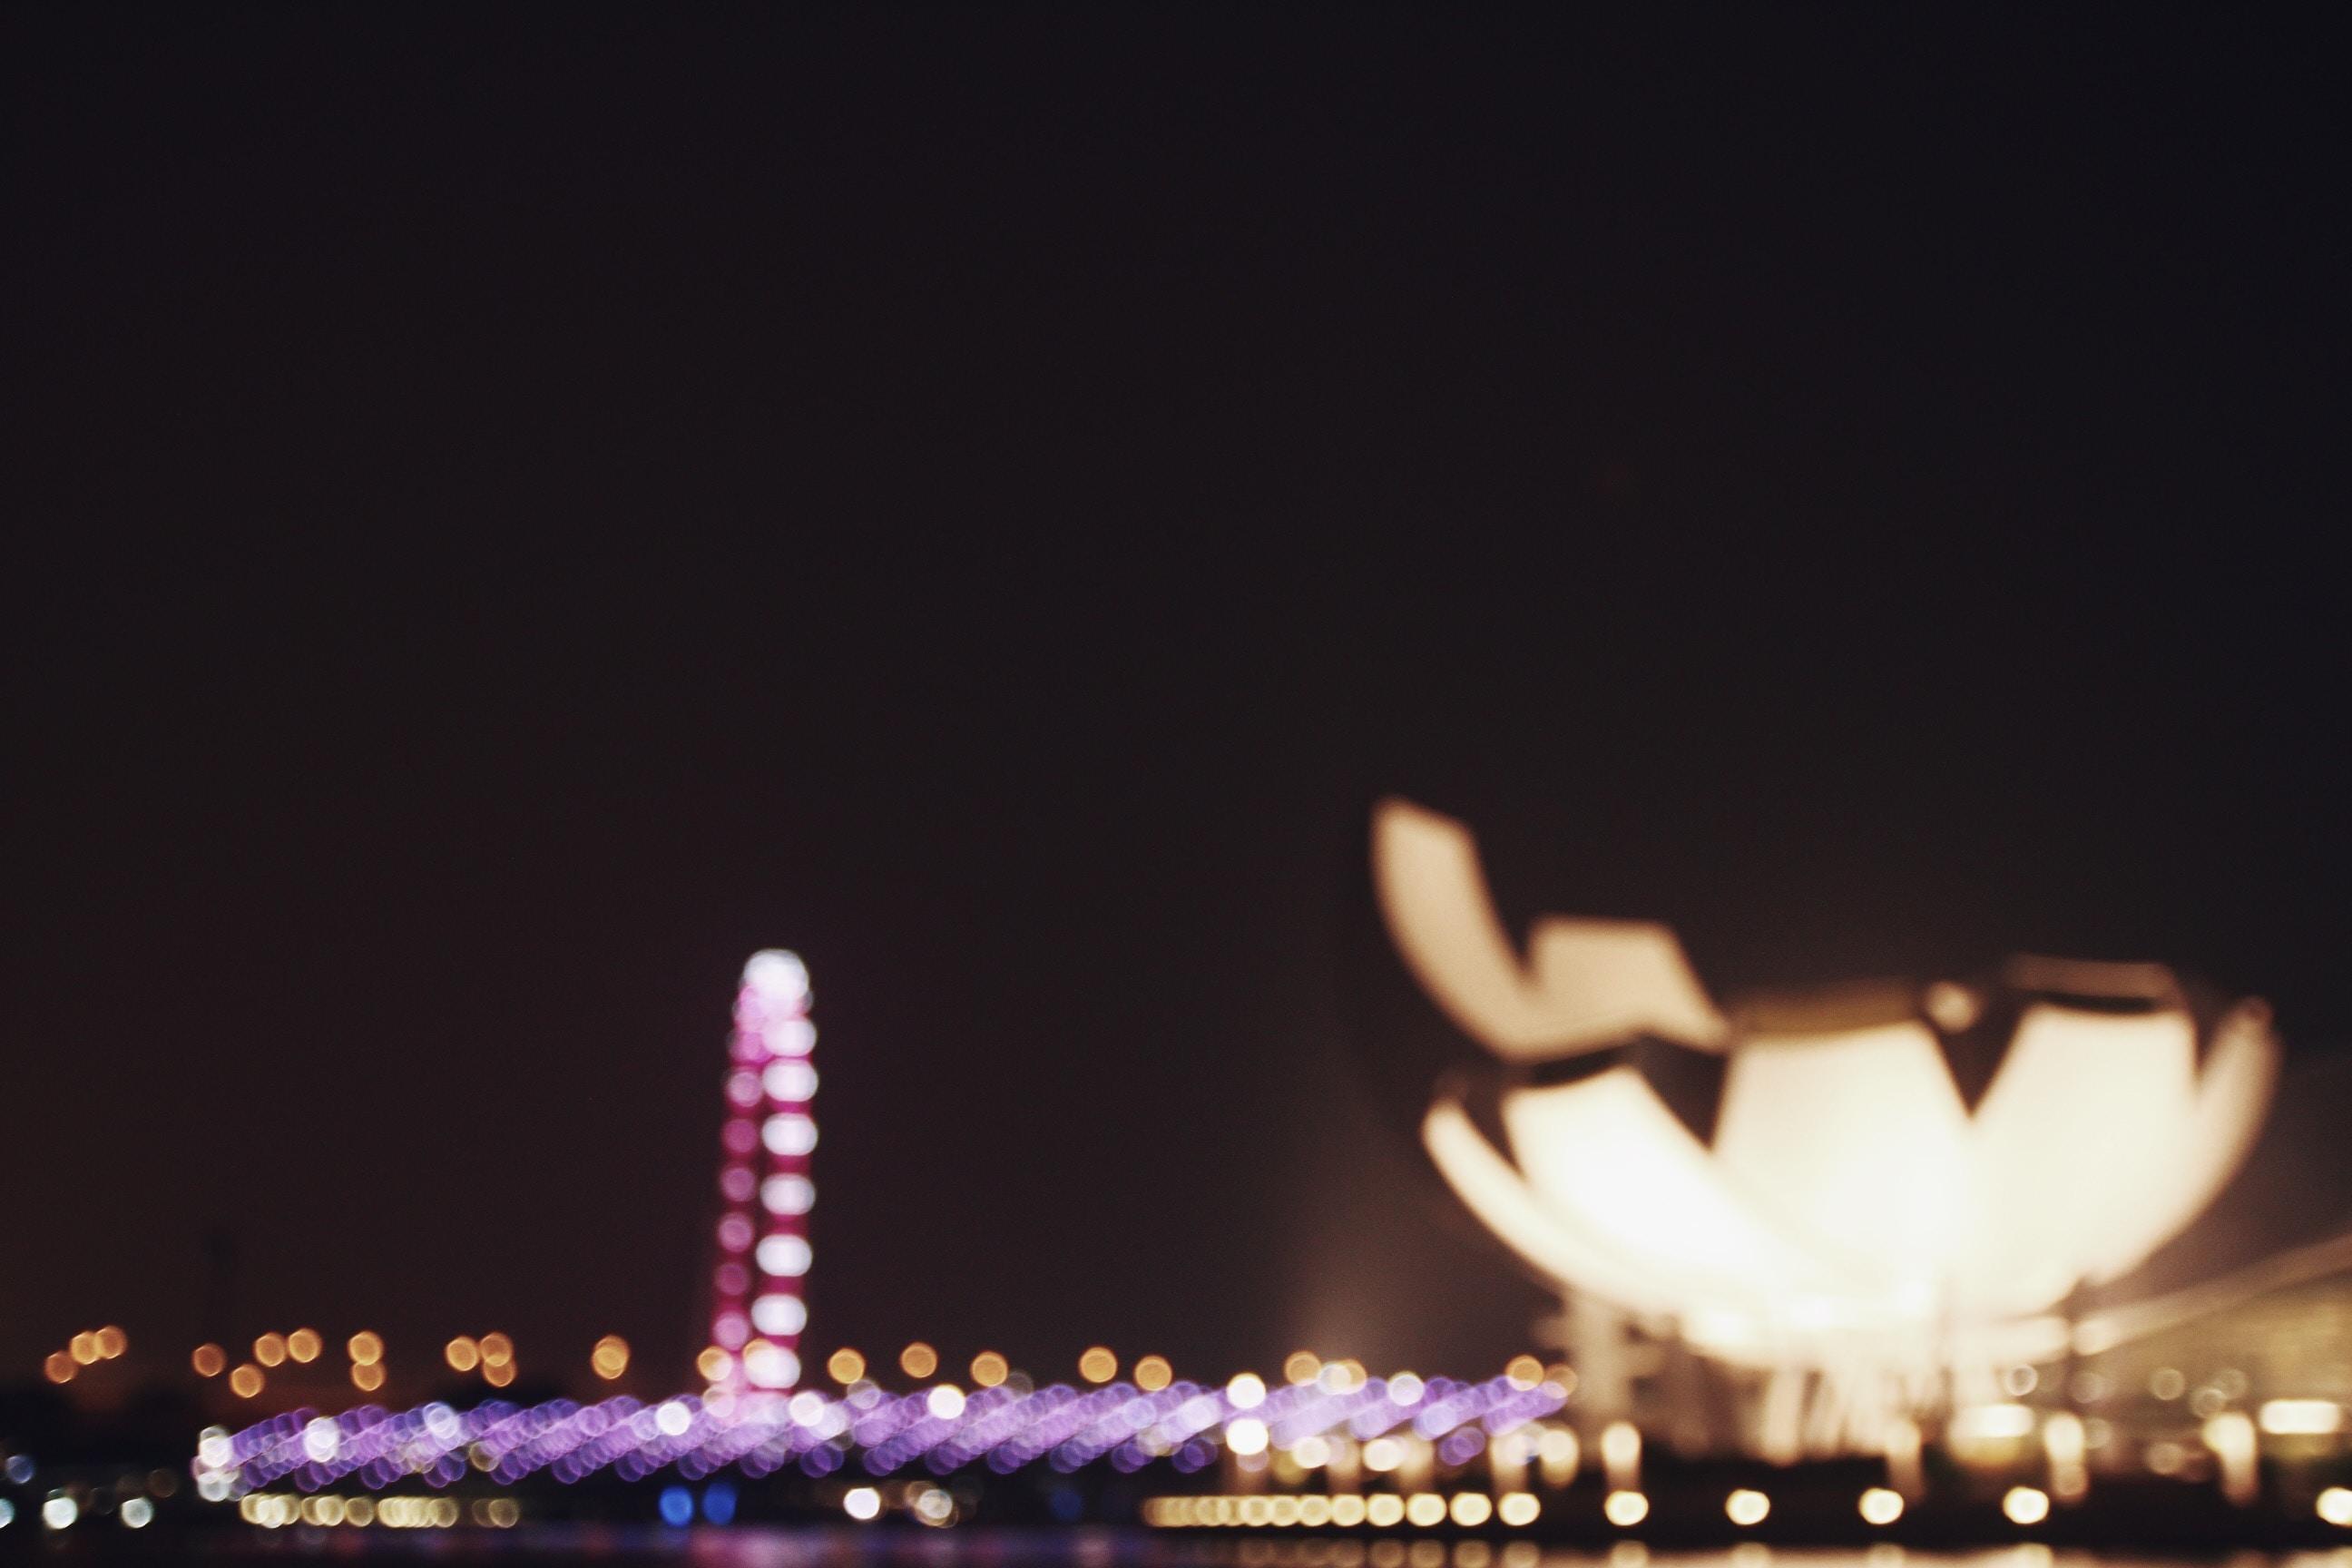 Free Unsplash photo from Suhyeon Choi